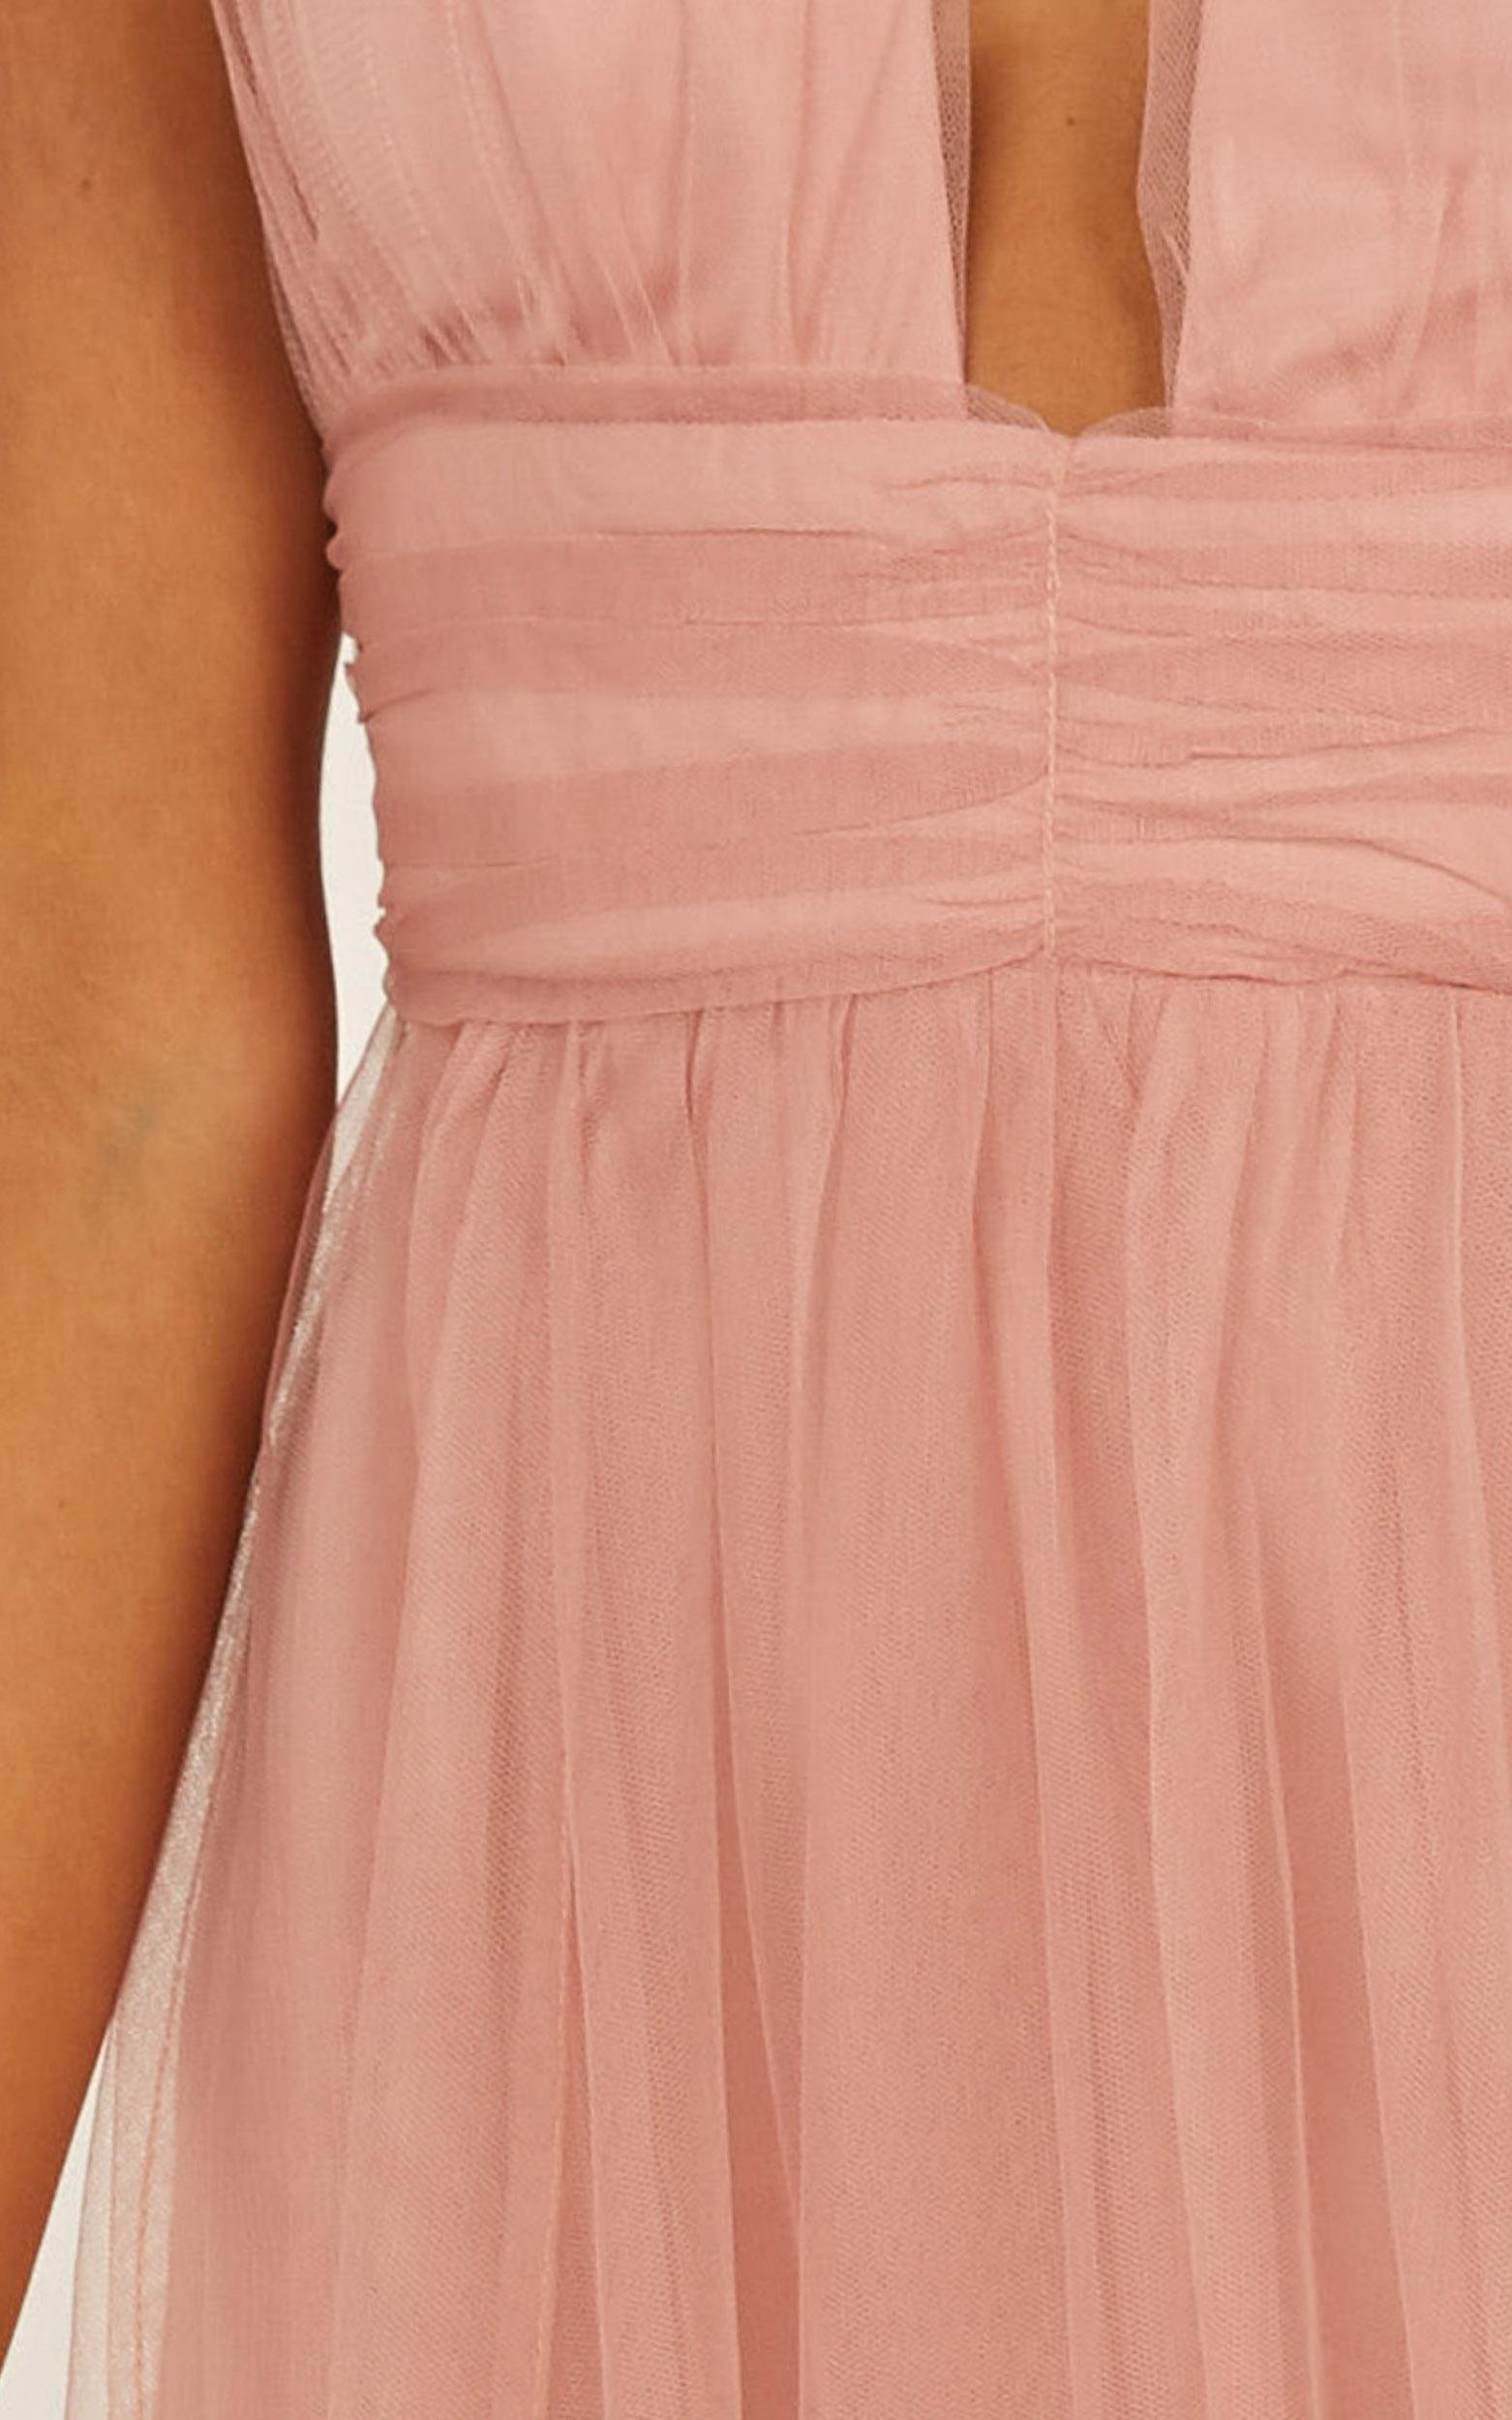 Honeymoon Avenue maxi dress in blush - 8 (S), Blush, hi-res image number null